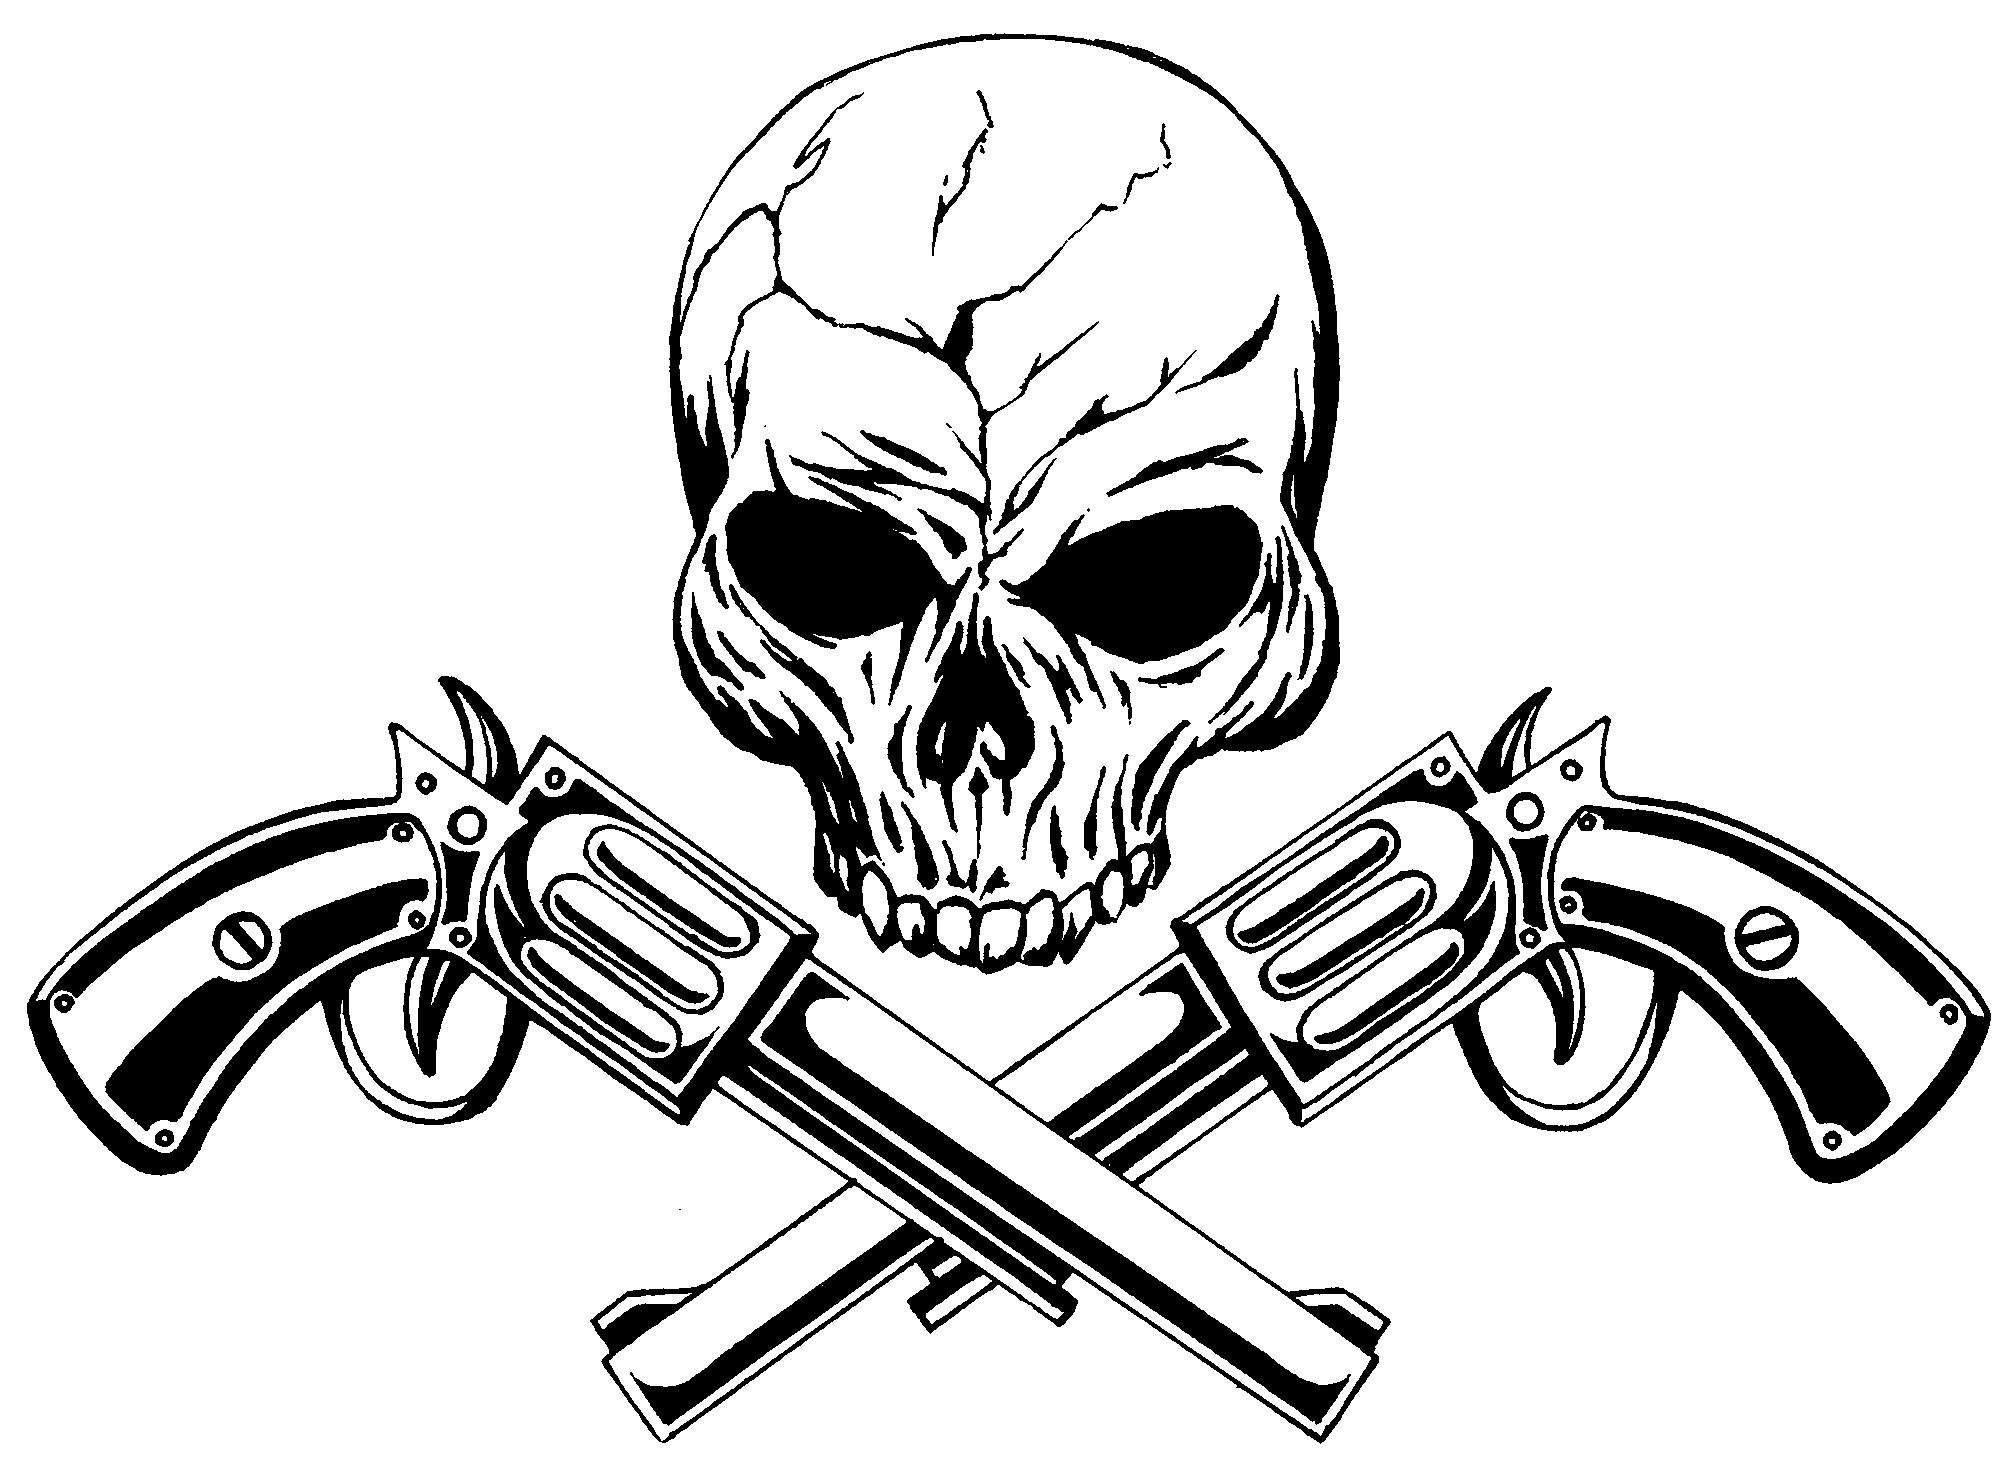 Gangster Skull Drawing At Getdrawings